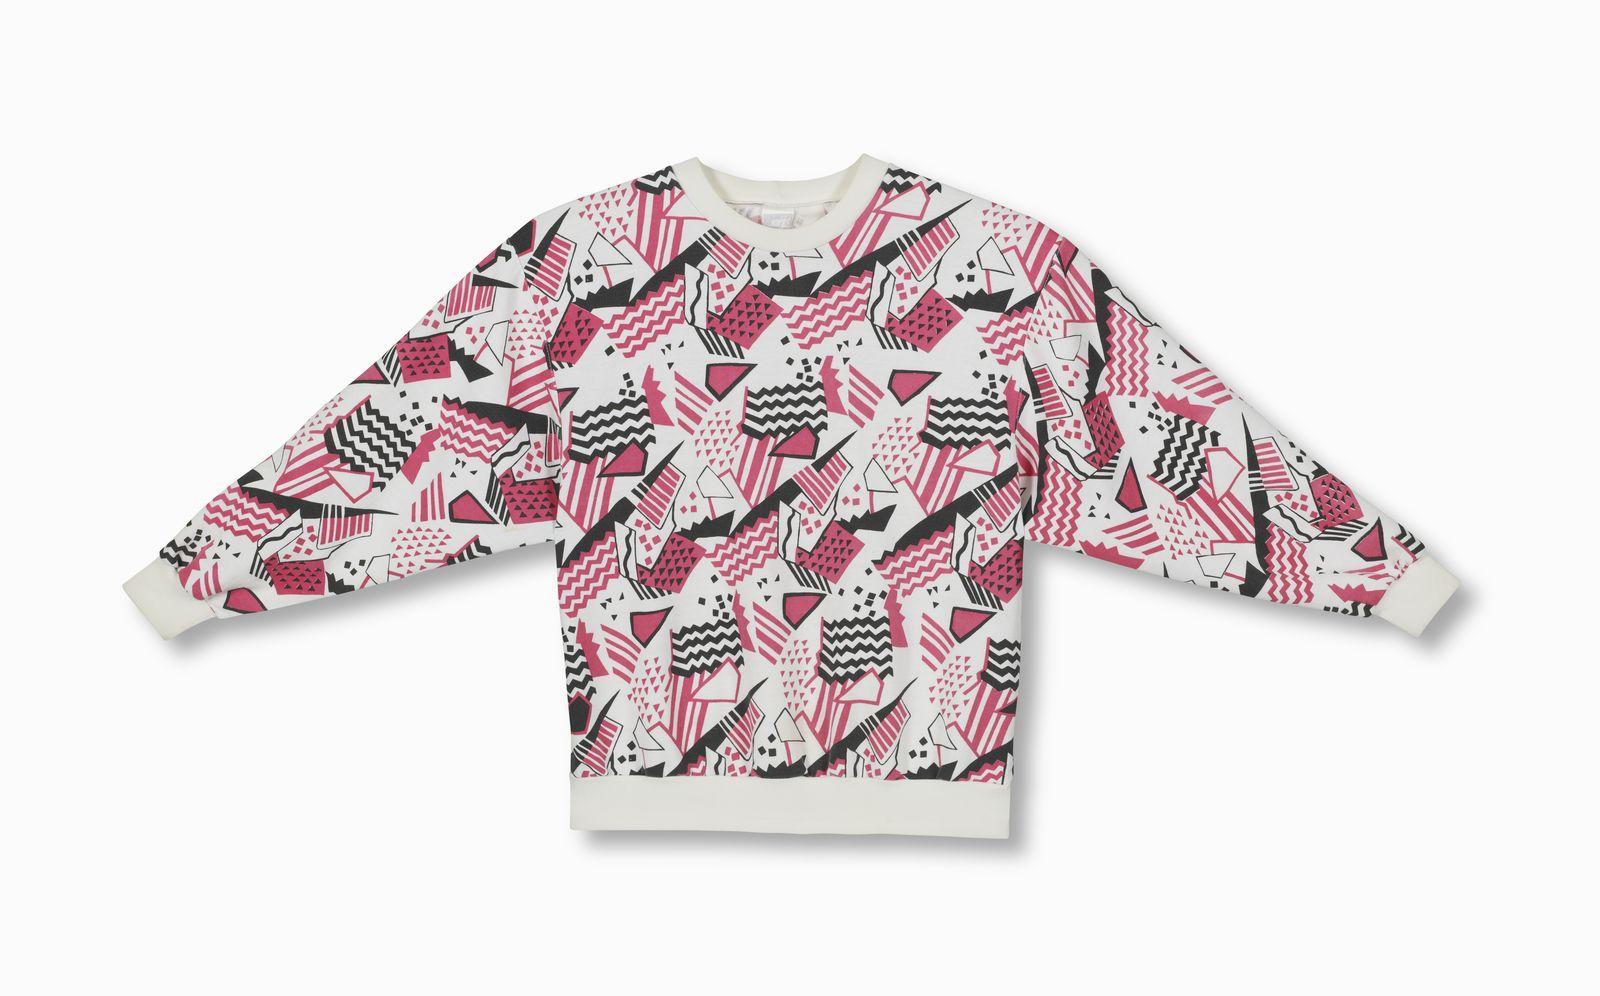 Shirt design history - 1987 Print Fleece Crew